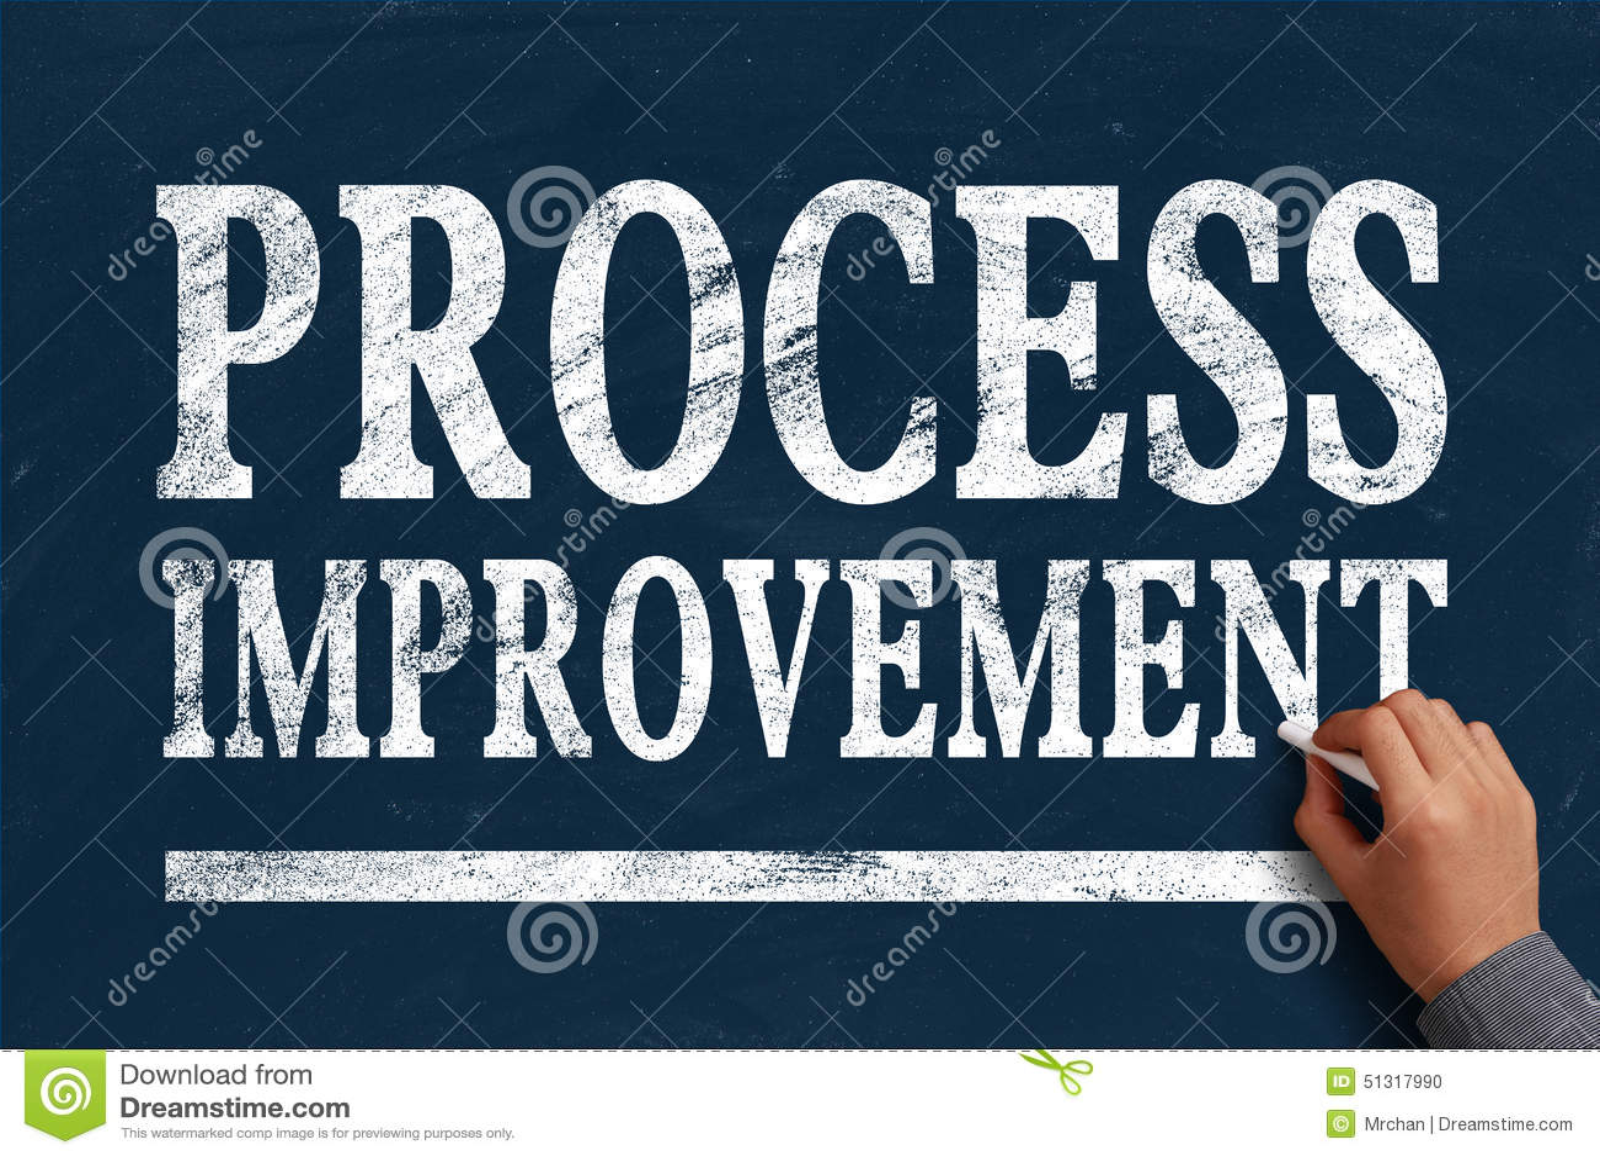 Process Improvement Stock Photo Image 51317990